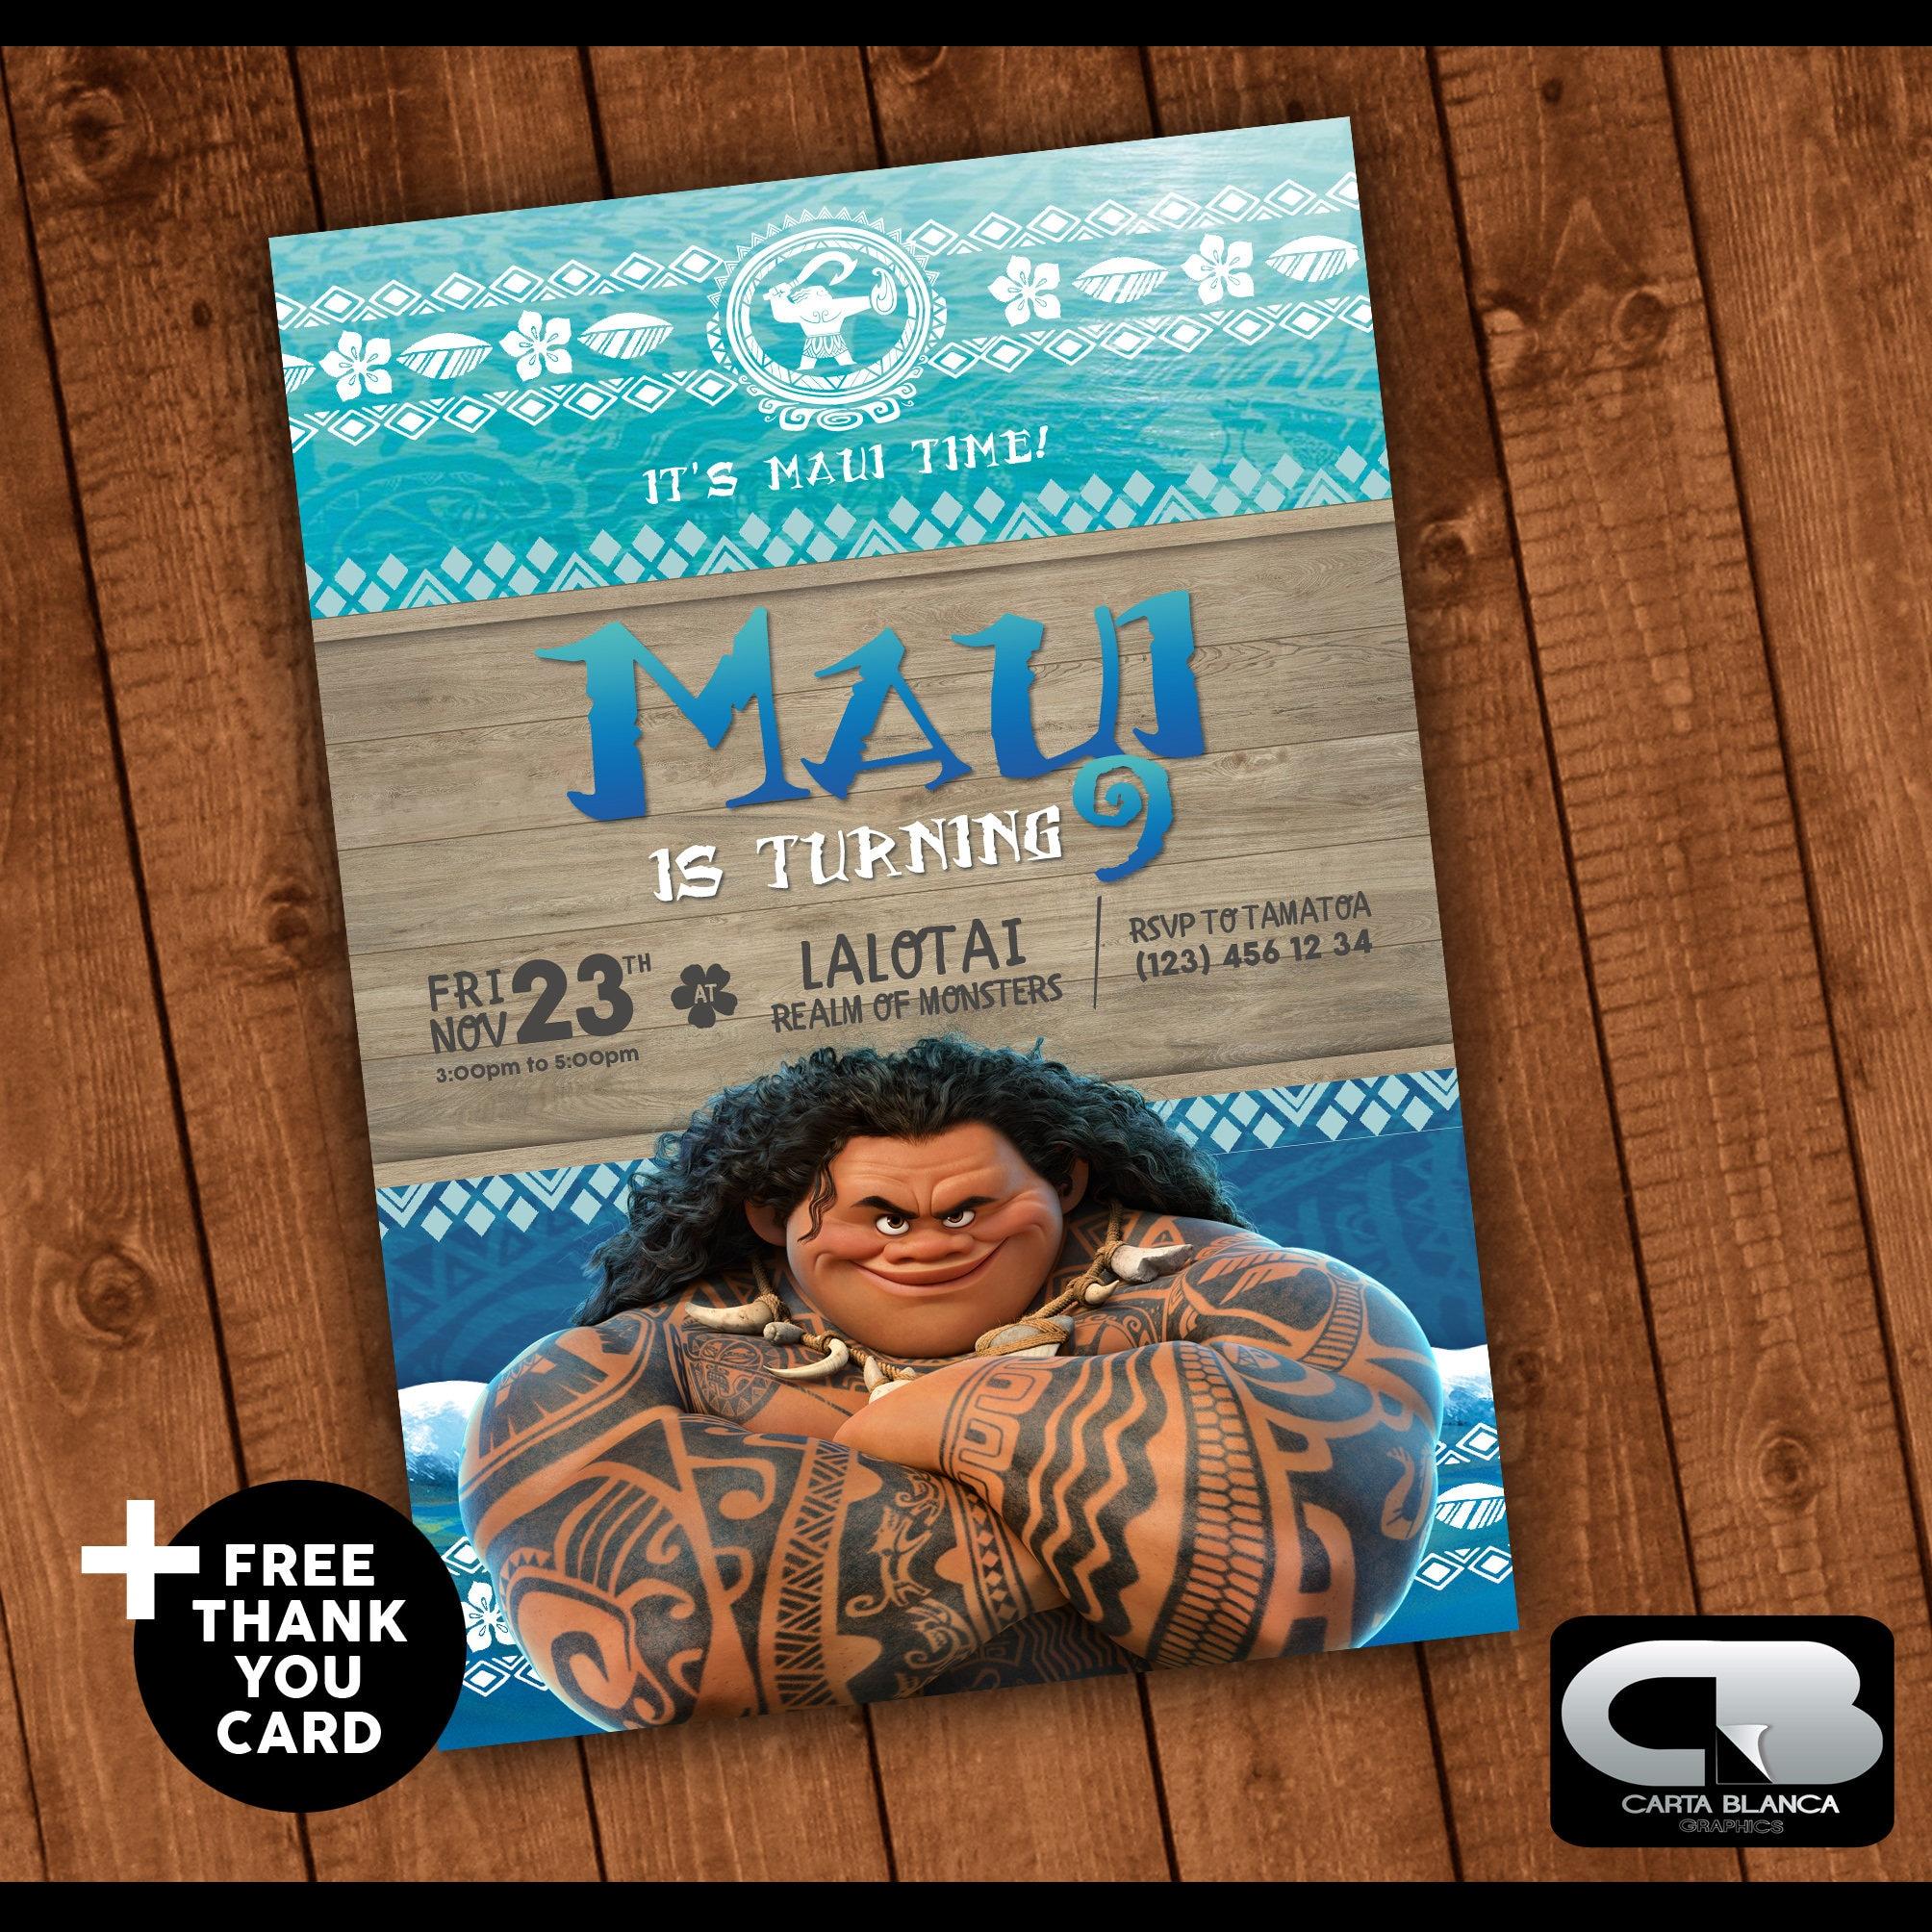 Maui Invitation With Free Thank You Card Maui Invite Moana Etsy